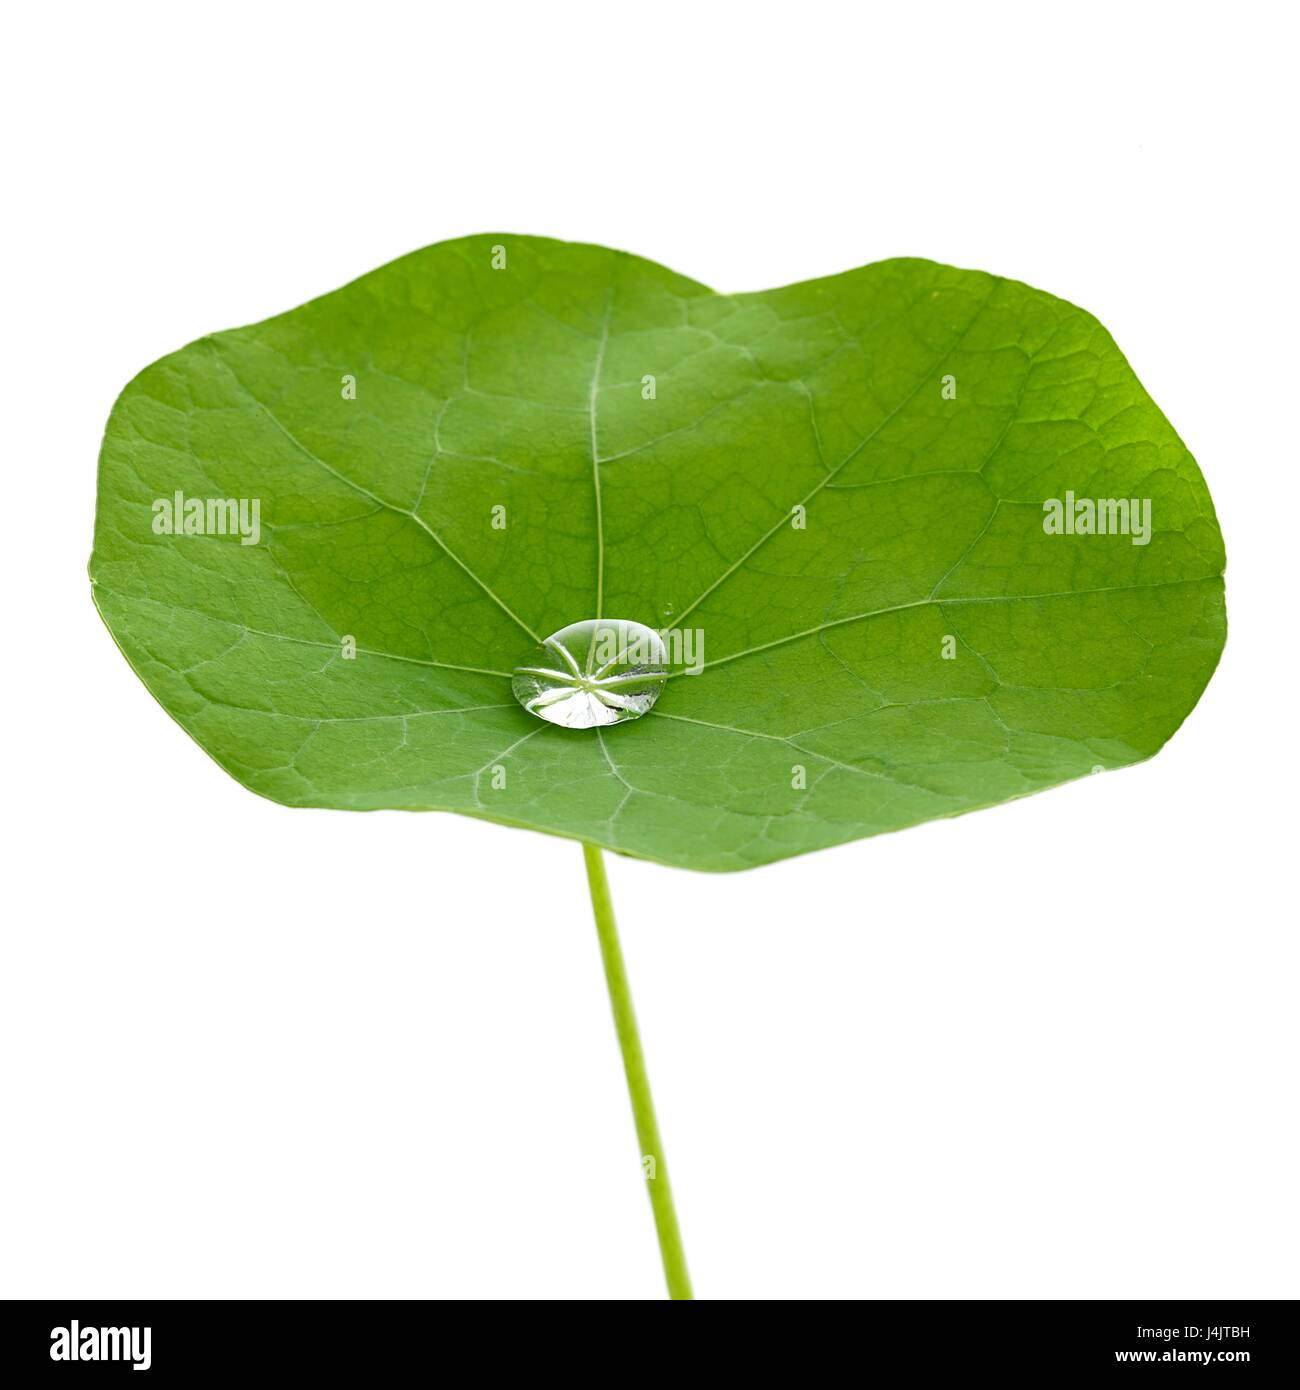 Nasturtium leaf with water droplet. - Stock Image